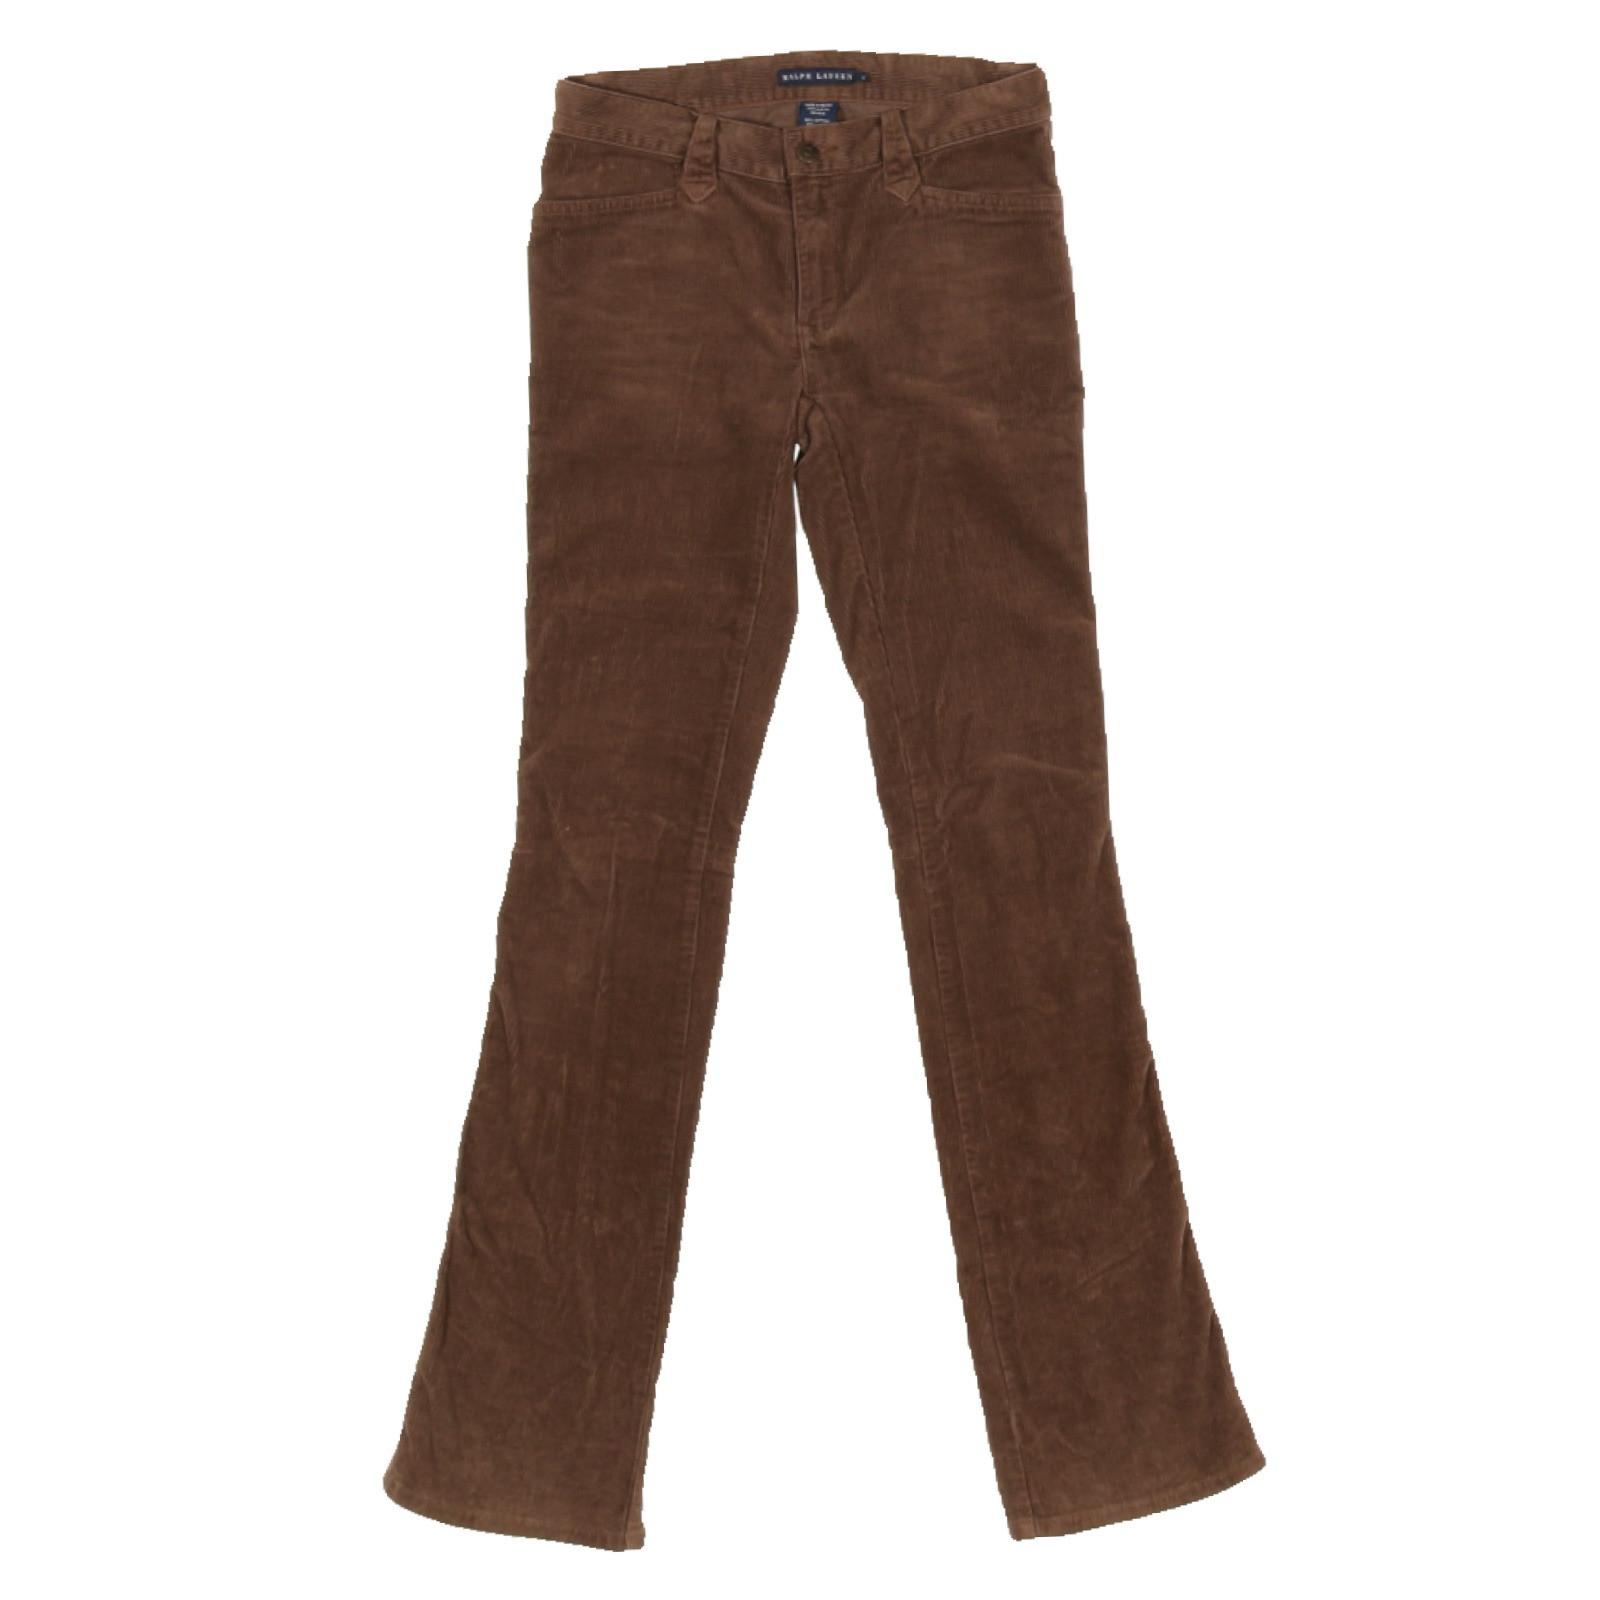 best shoes catch official supplier Ralph Lauren Trousers Cotton in Brown - Second Hand Ralph Lauren ...